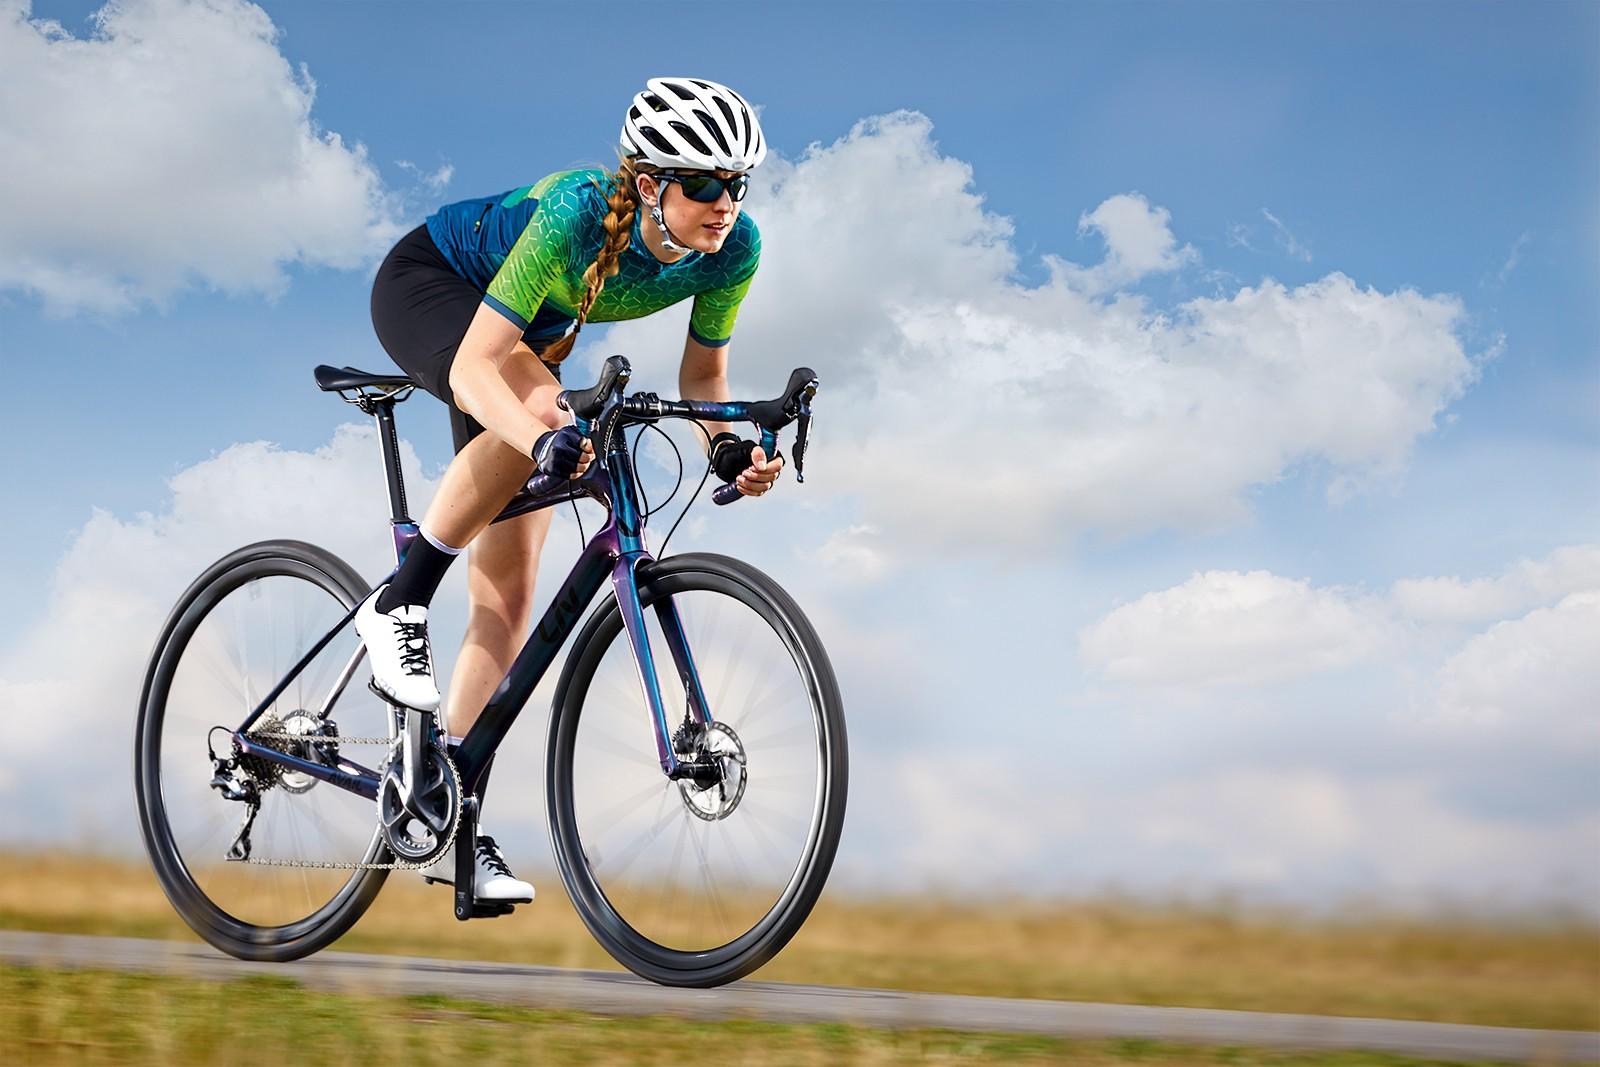 Cyclist riding a Liv Avail Advanced Pro 2 woman's road bike